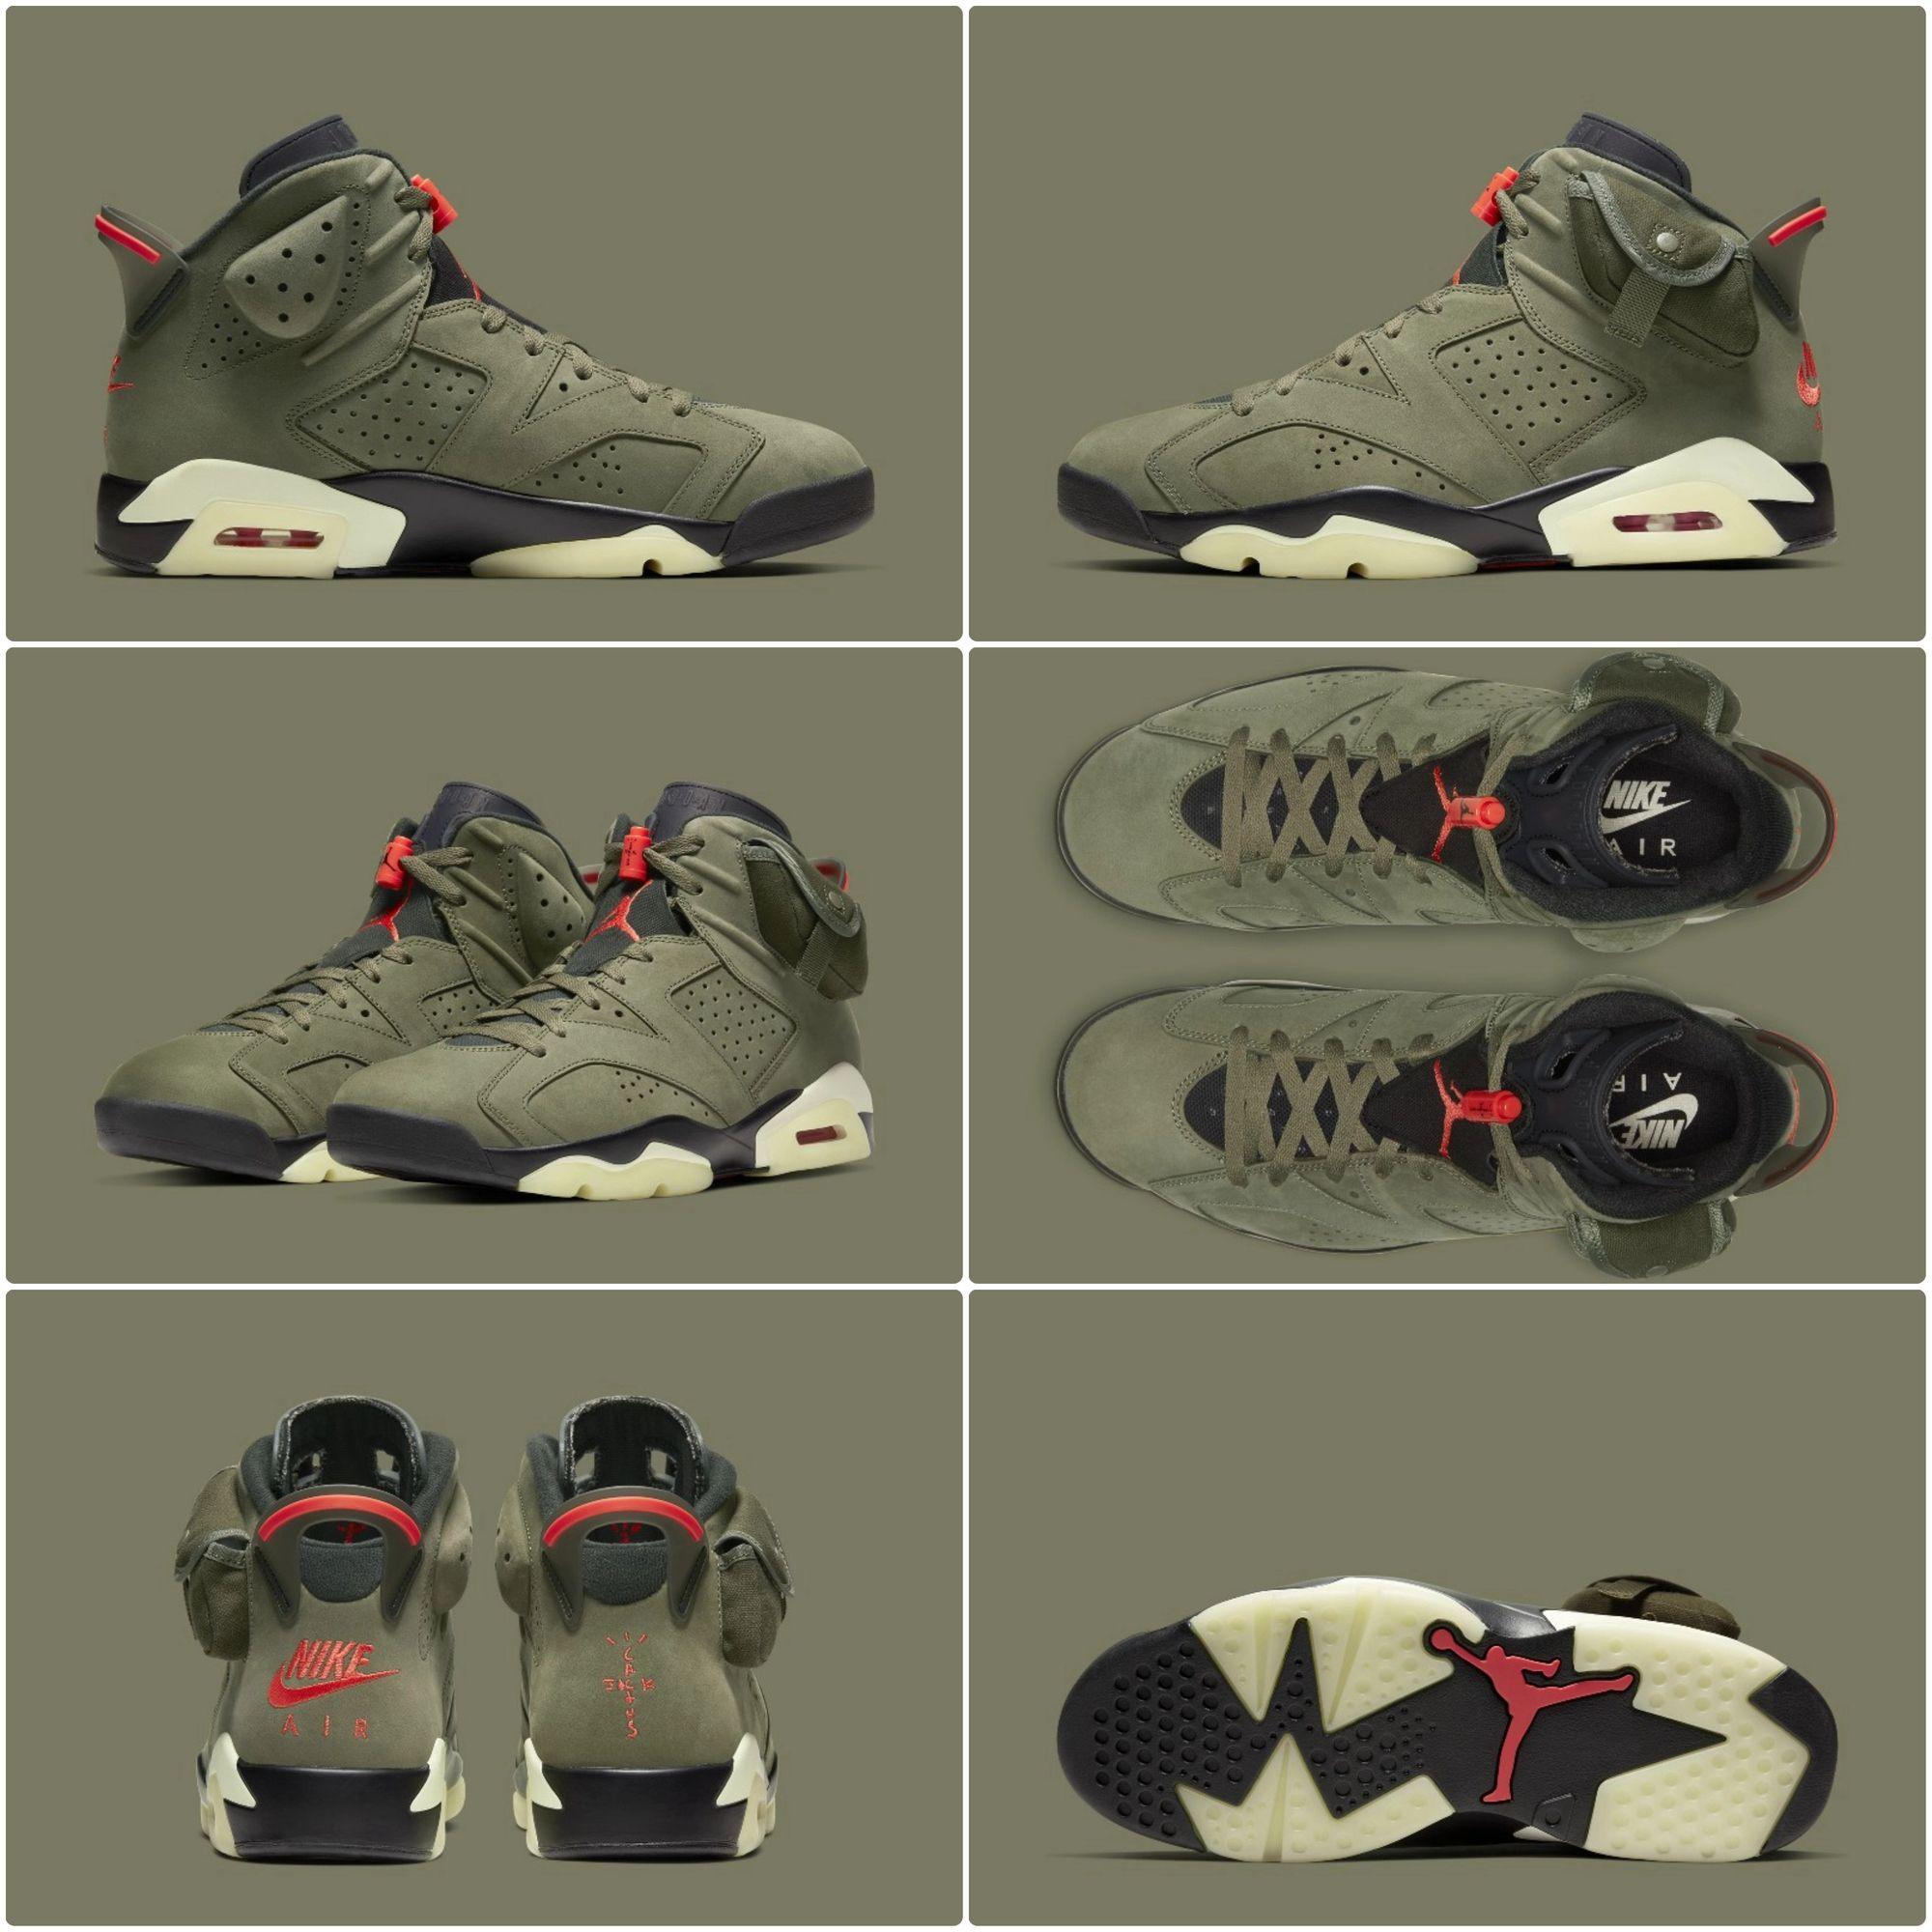 Pin By Grailify On Sneakers Sneakers Men Fashion Air Jordans Retro Sneakers